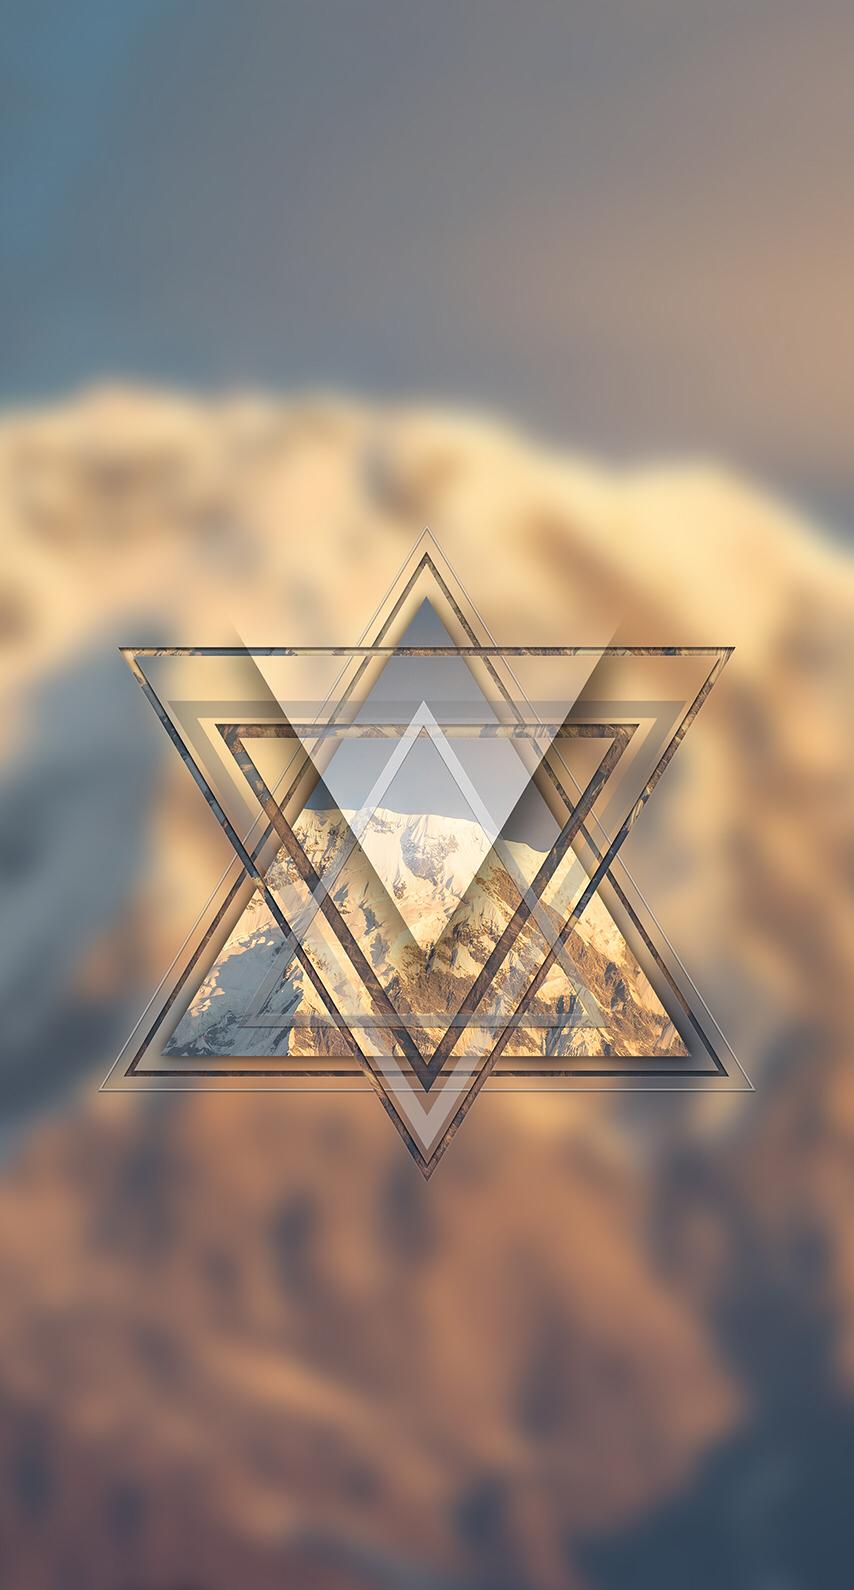 Star Wallpaper, Wallpaper Backgrounds, Iphone Wallpapers, Star Background, Judaism, Jewish Art